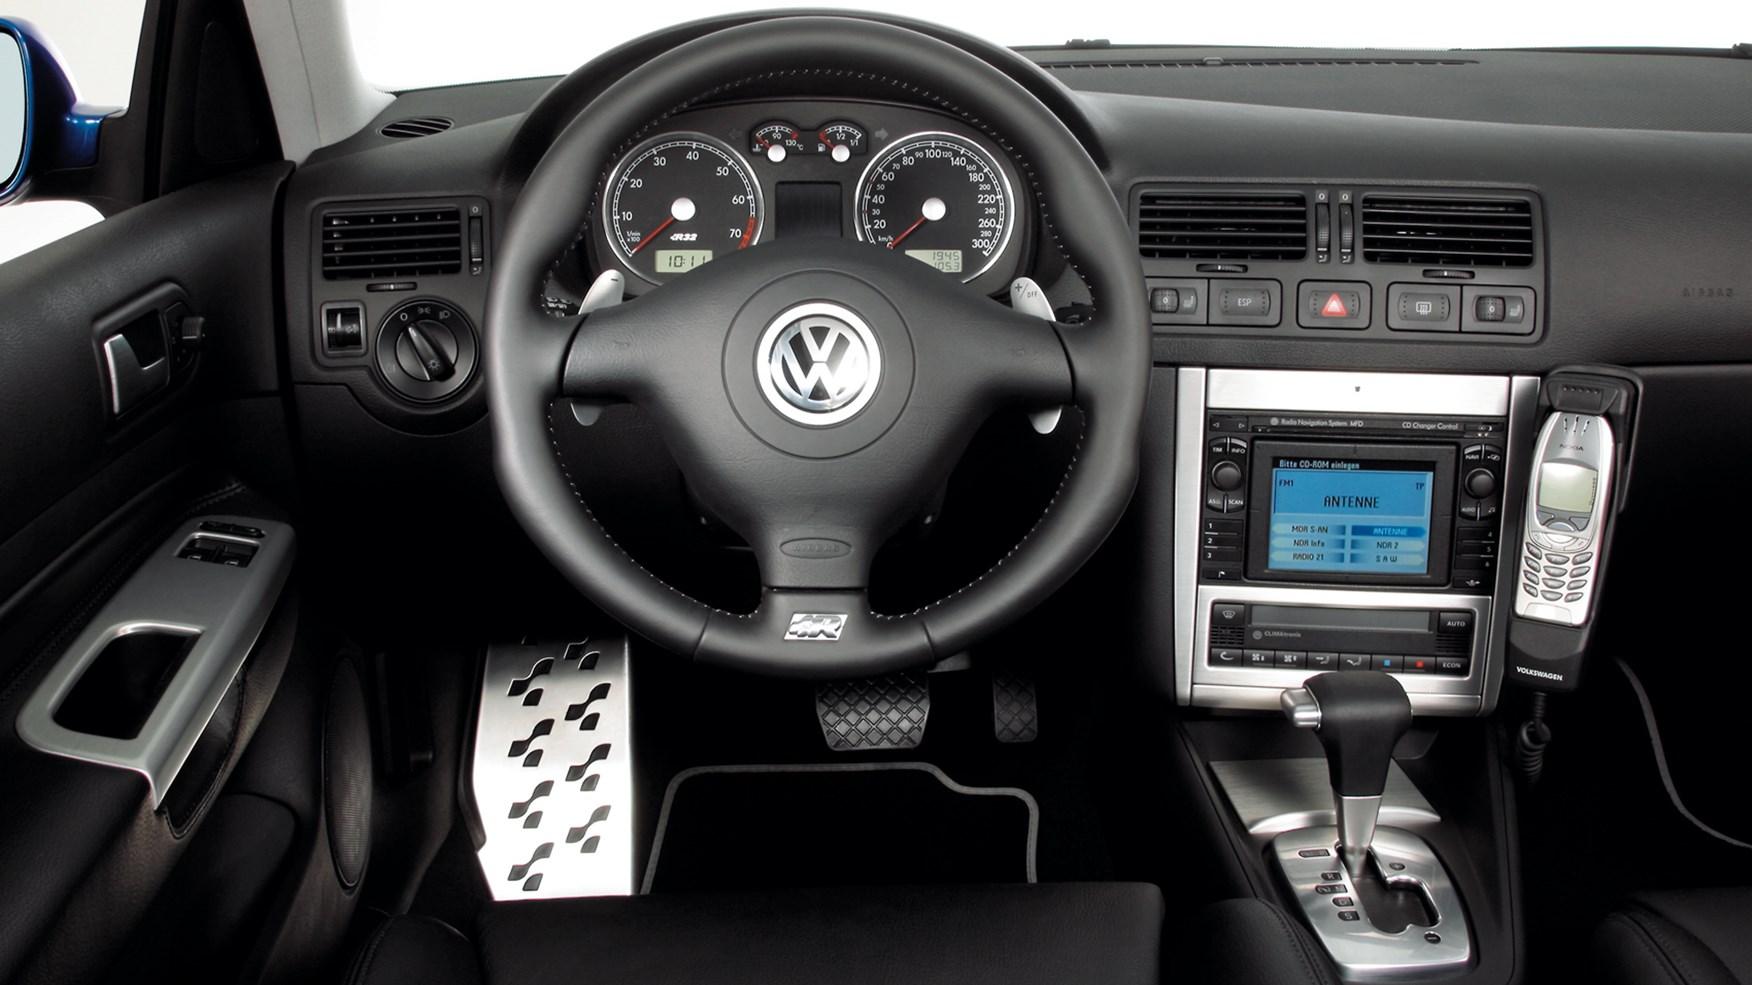 Driving the classics: Volkswagen Golf R32 Mk4 (2002) review | CAR Magazine